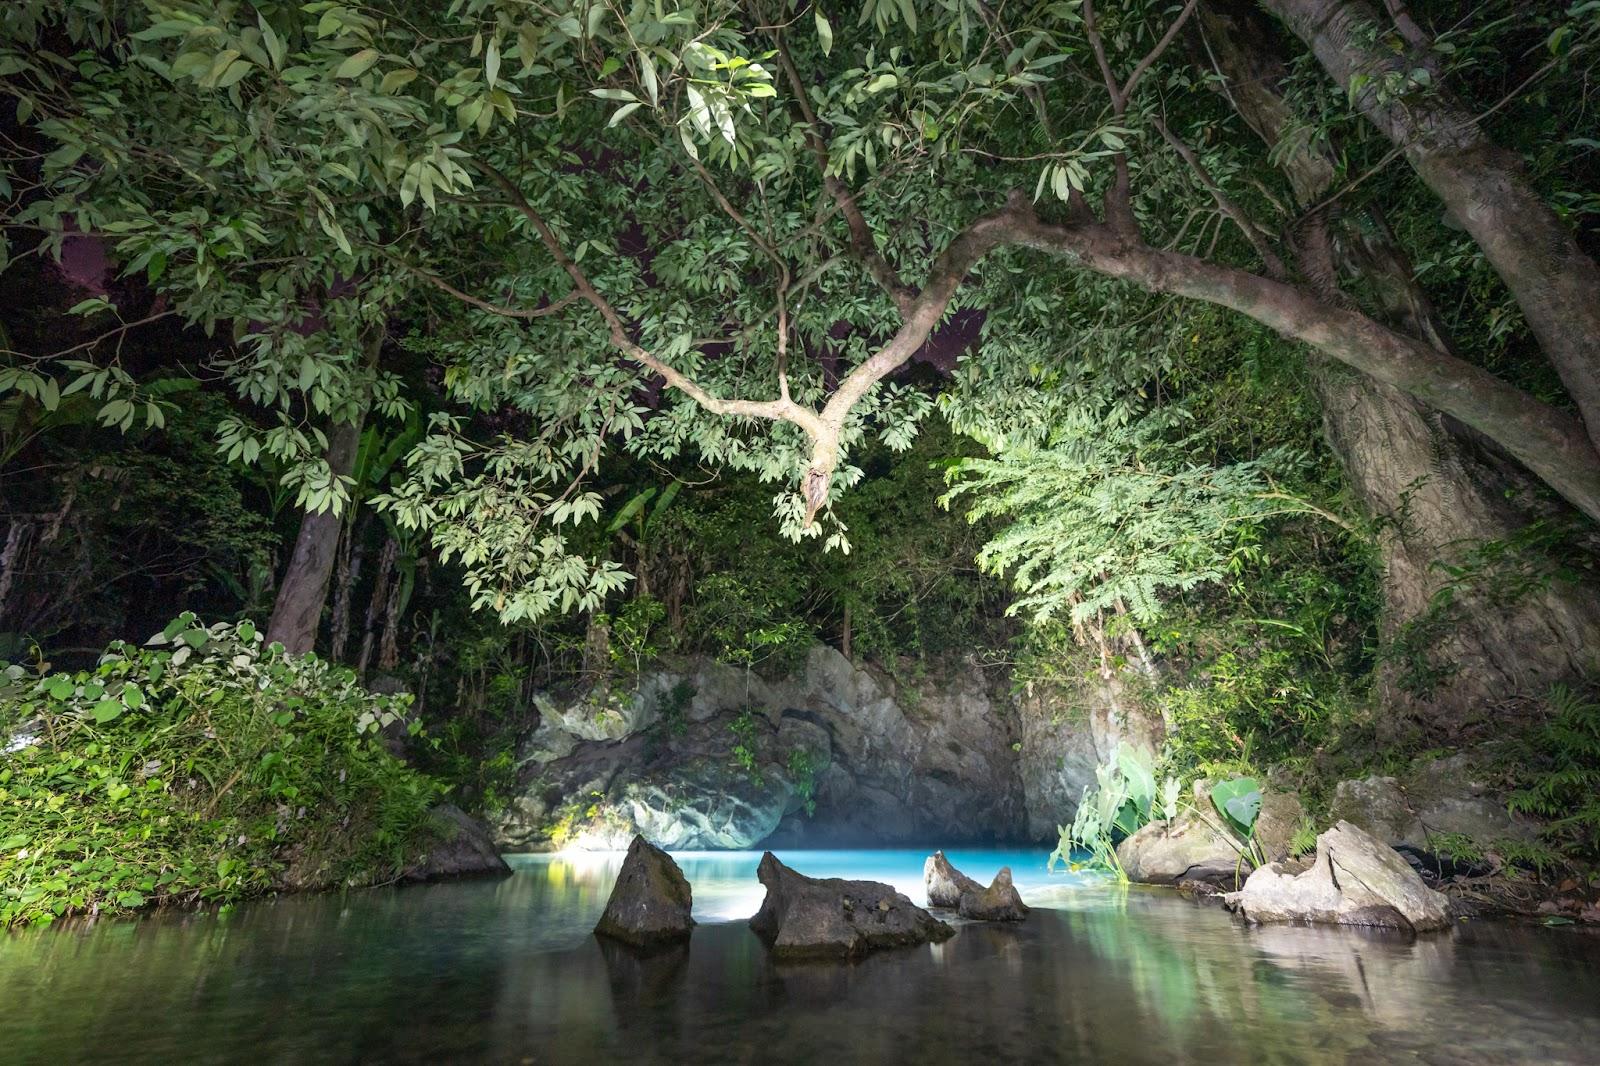 Cave and rivers - Exploring Fantastic Phong Nha with Jungle Boss